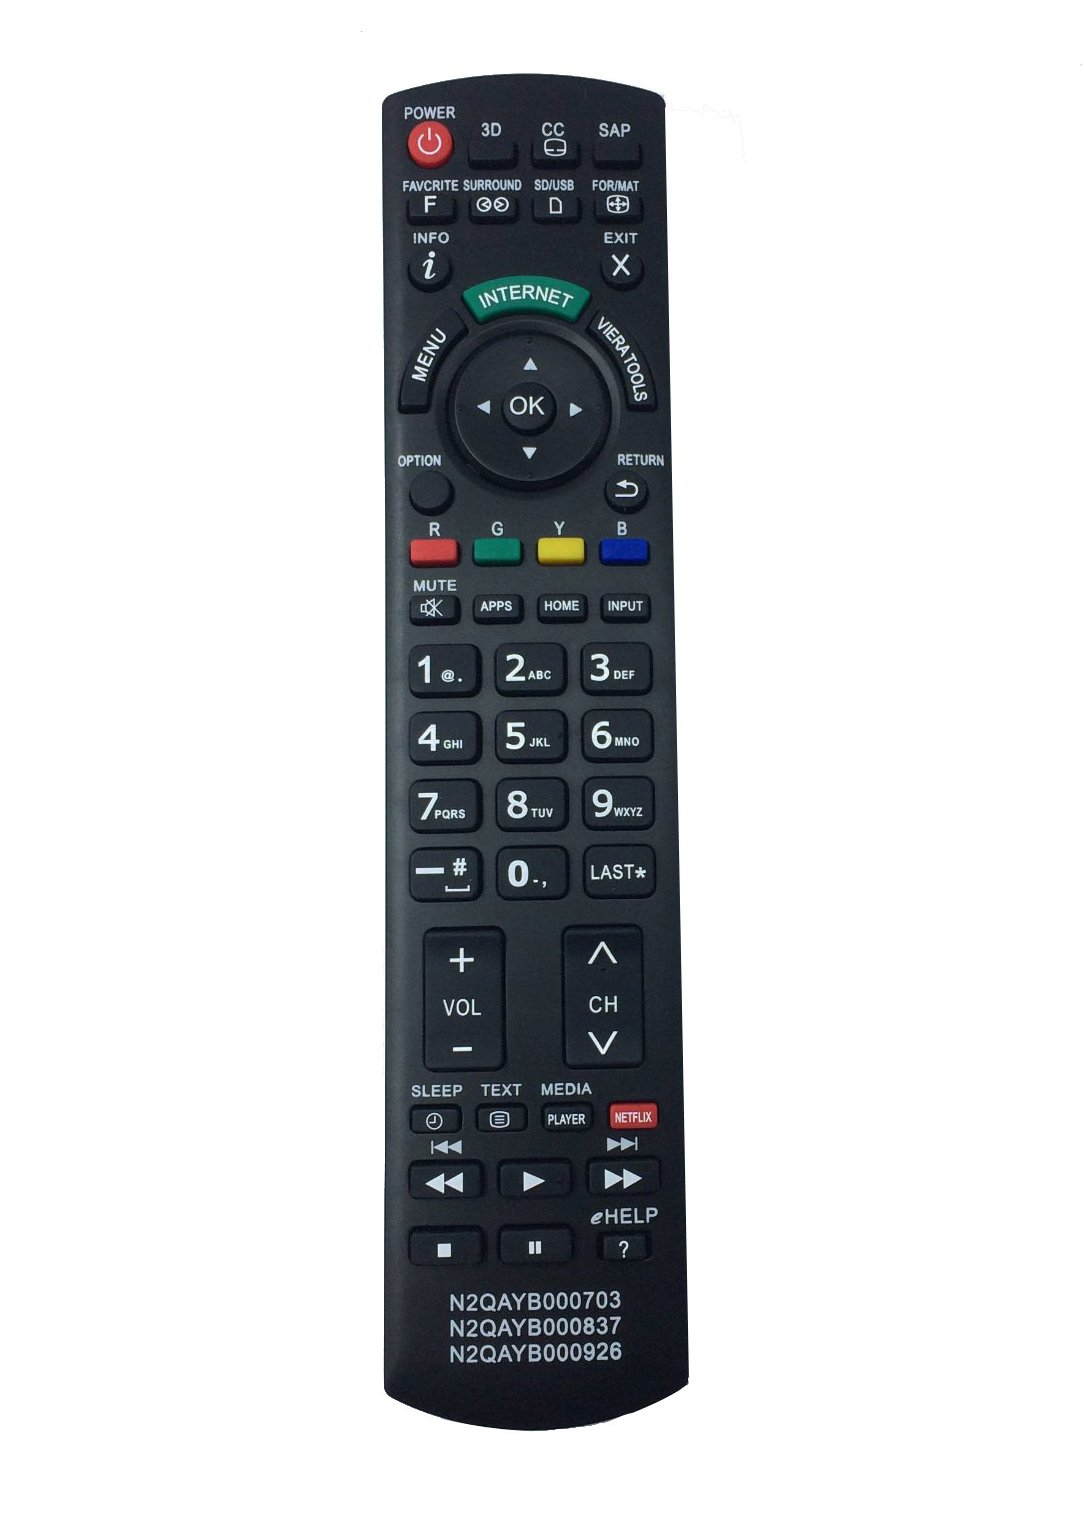 Control Remoto N2qayb000703 N2qayb000837 N2qayb000926 Pan...